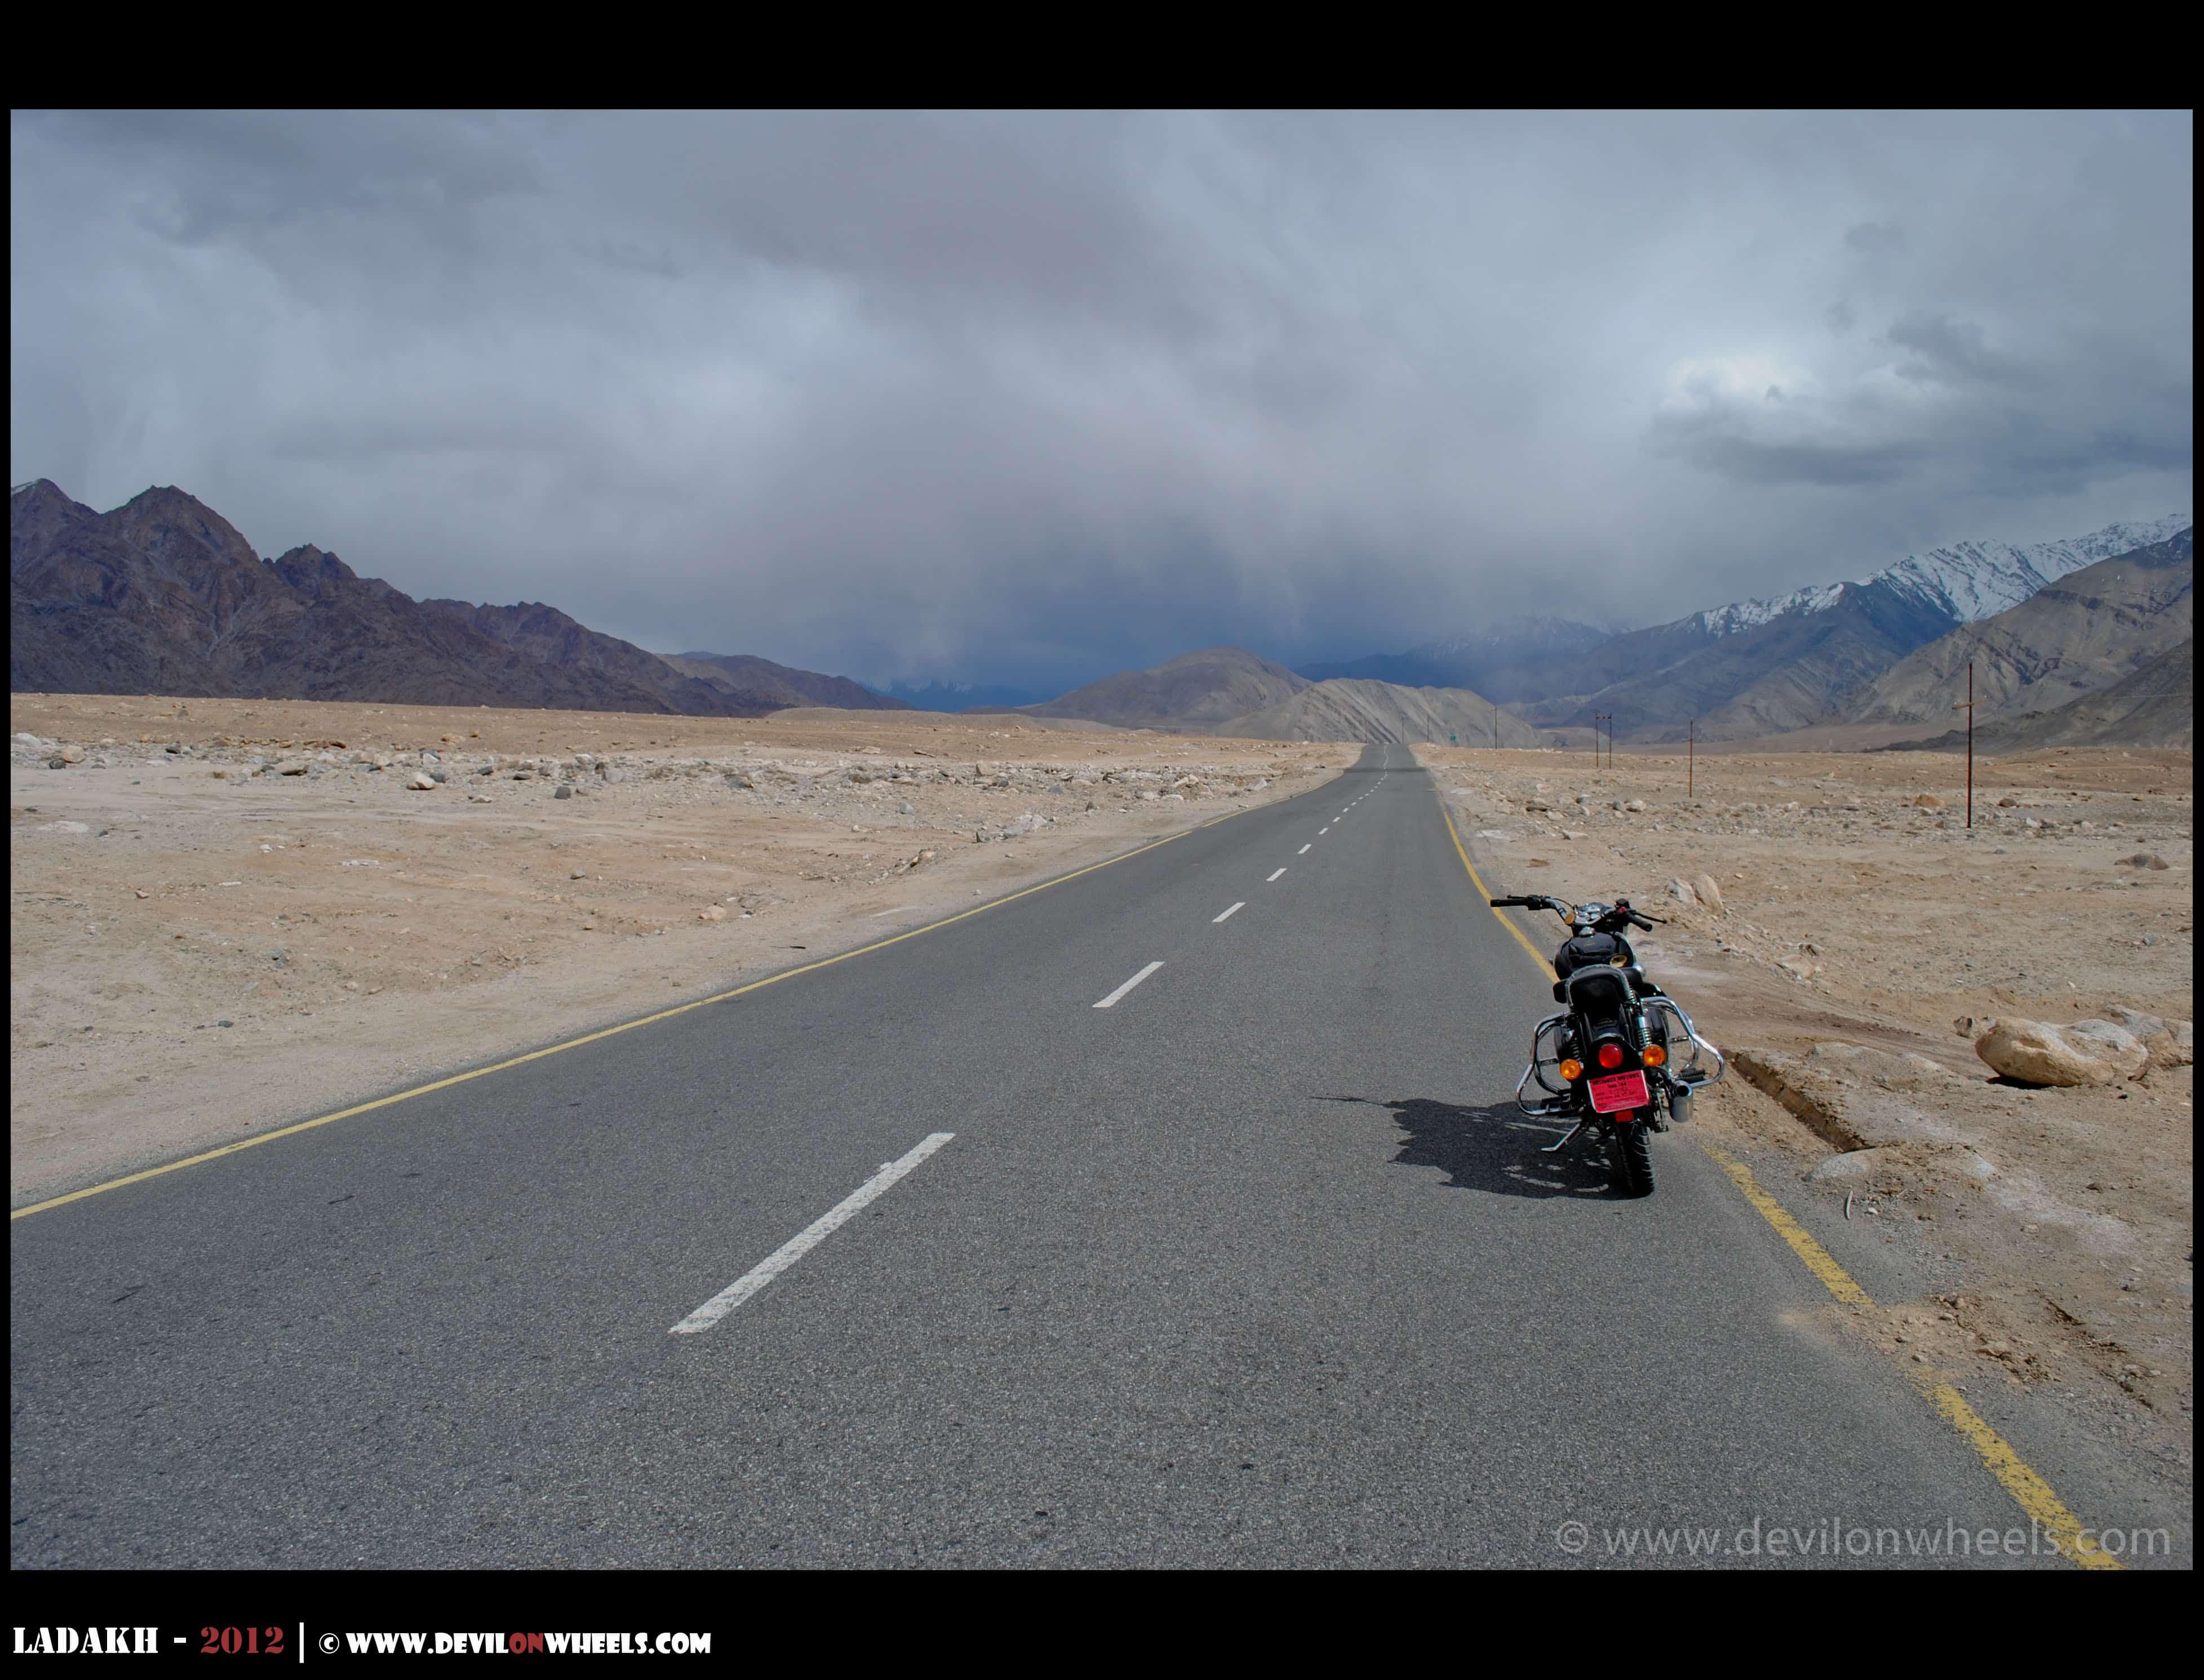 A trip to Ladakh on bike